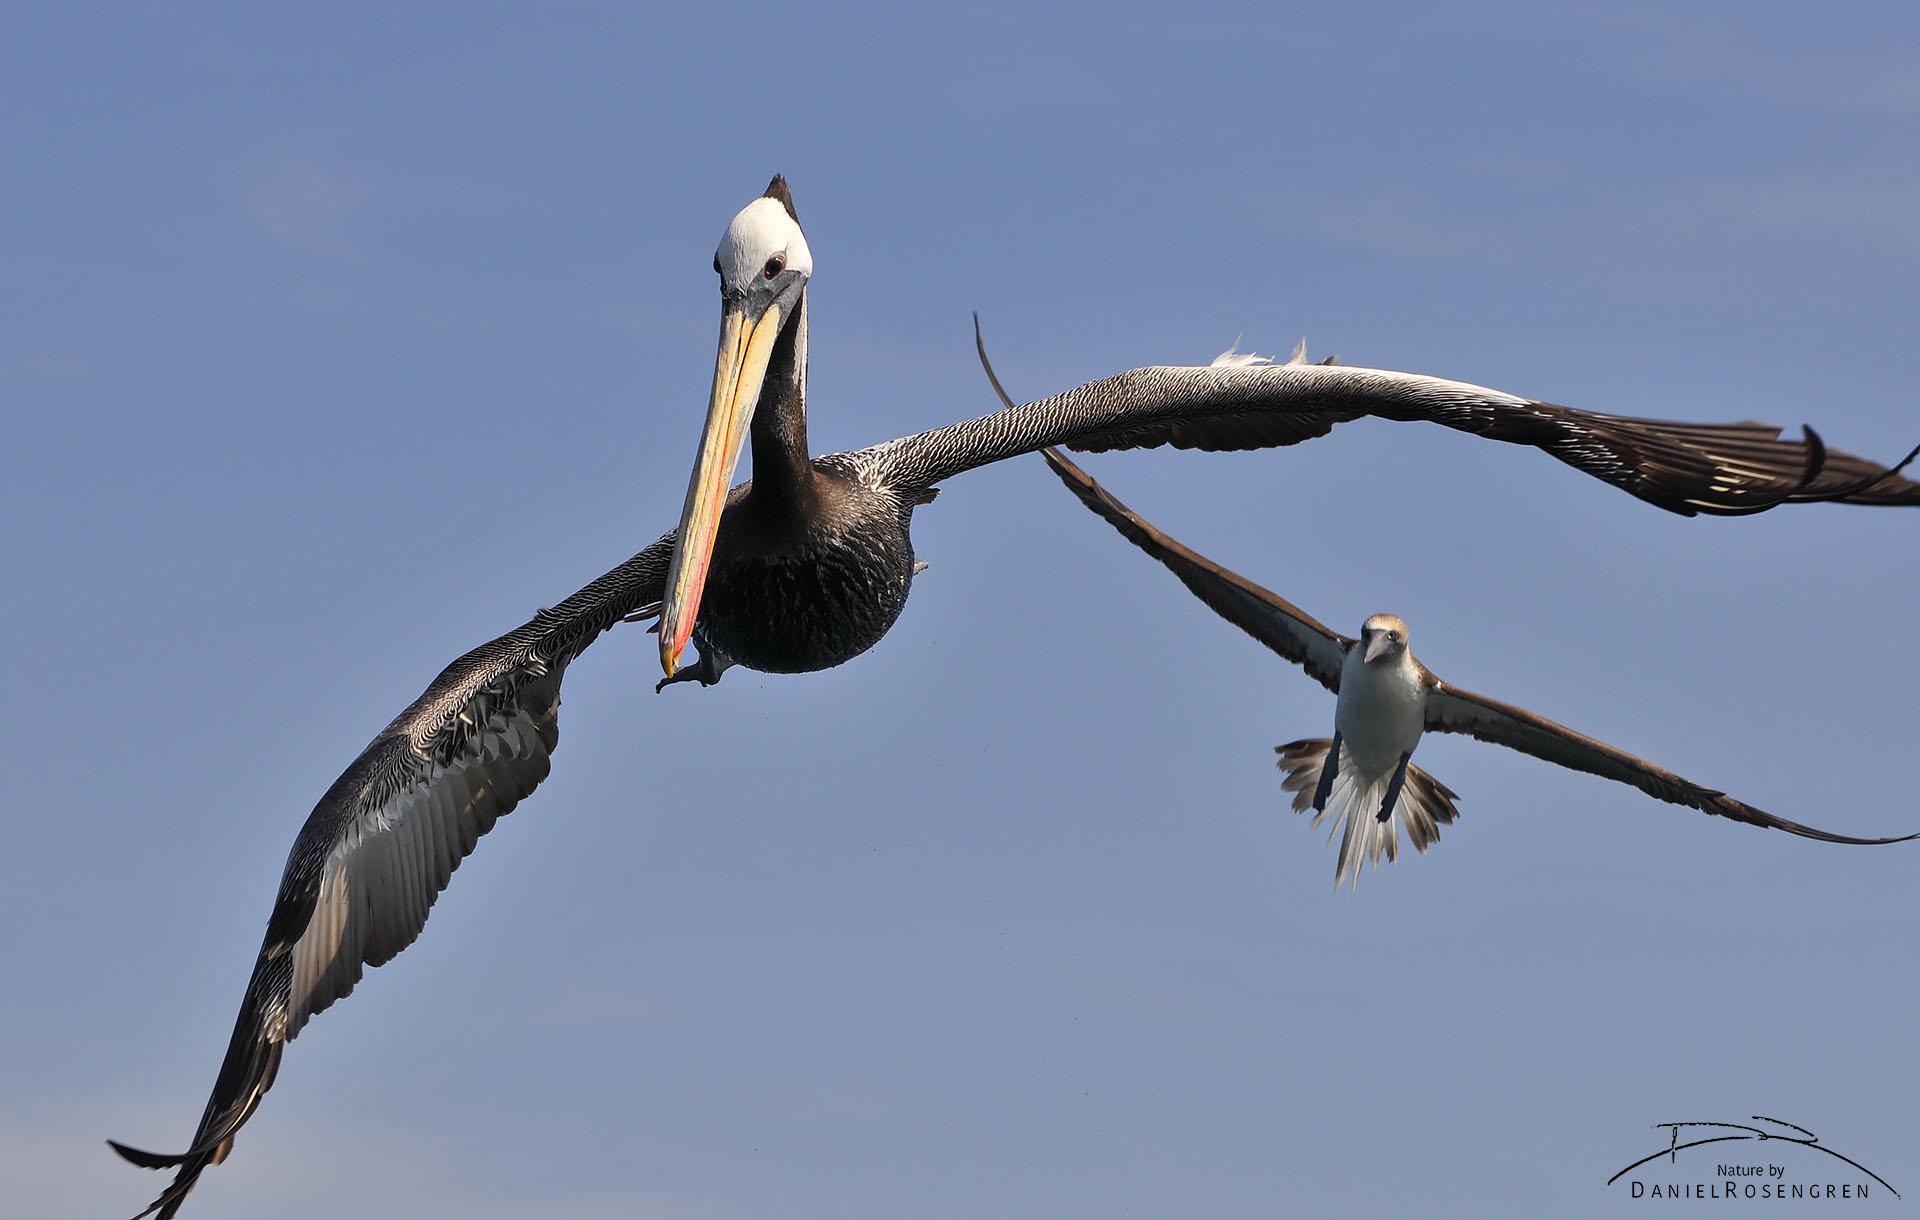 A Peruvian pelican arriving at the feeding frenzy. © Daniel Rosengren